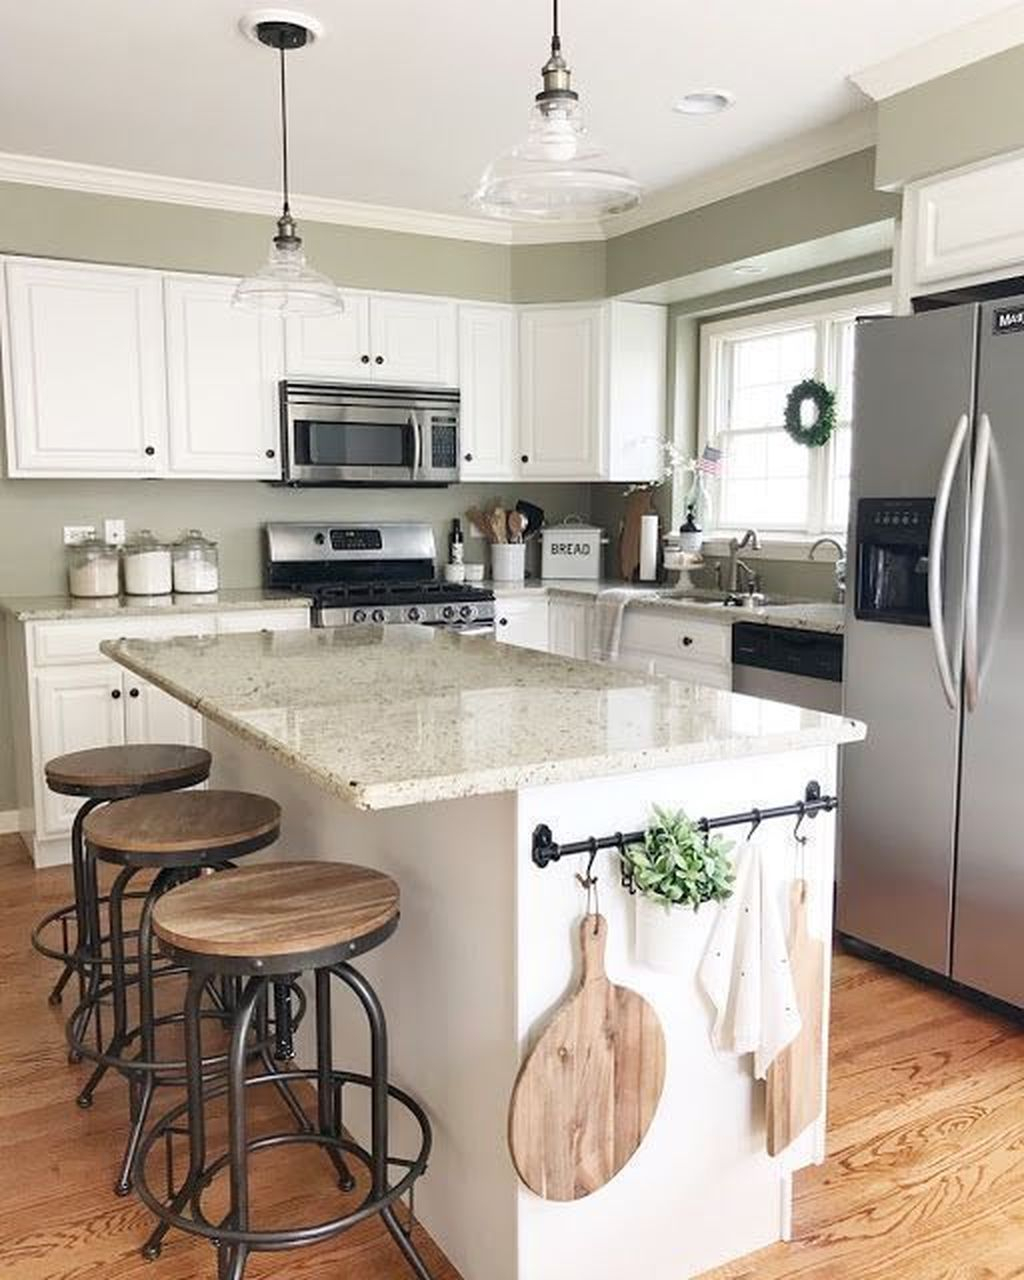 Brilliant Small Kitchen Remodel Design Ideas On A Budget 02